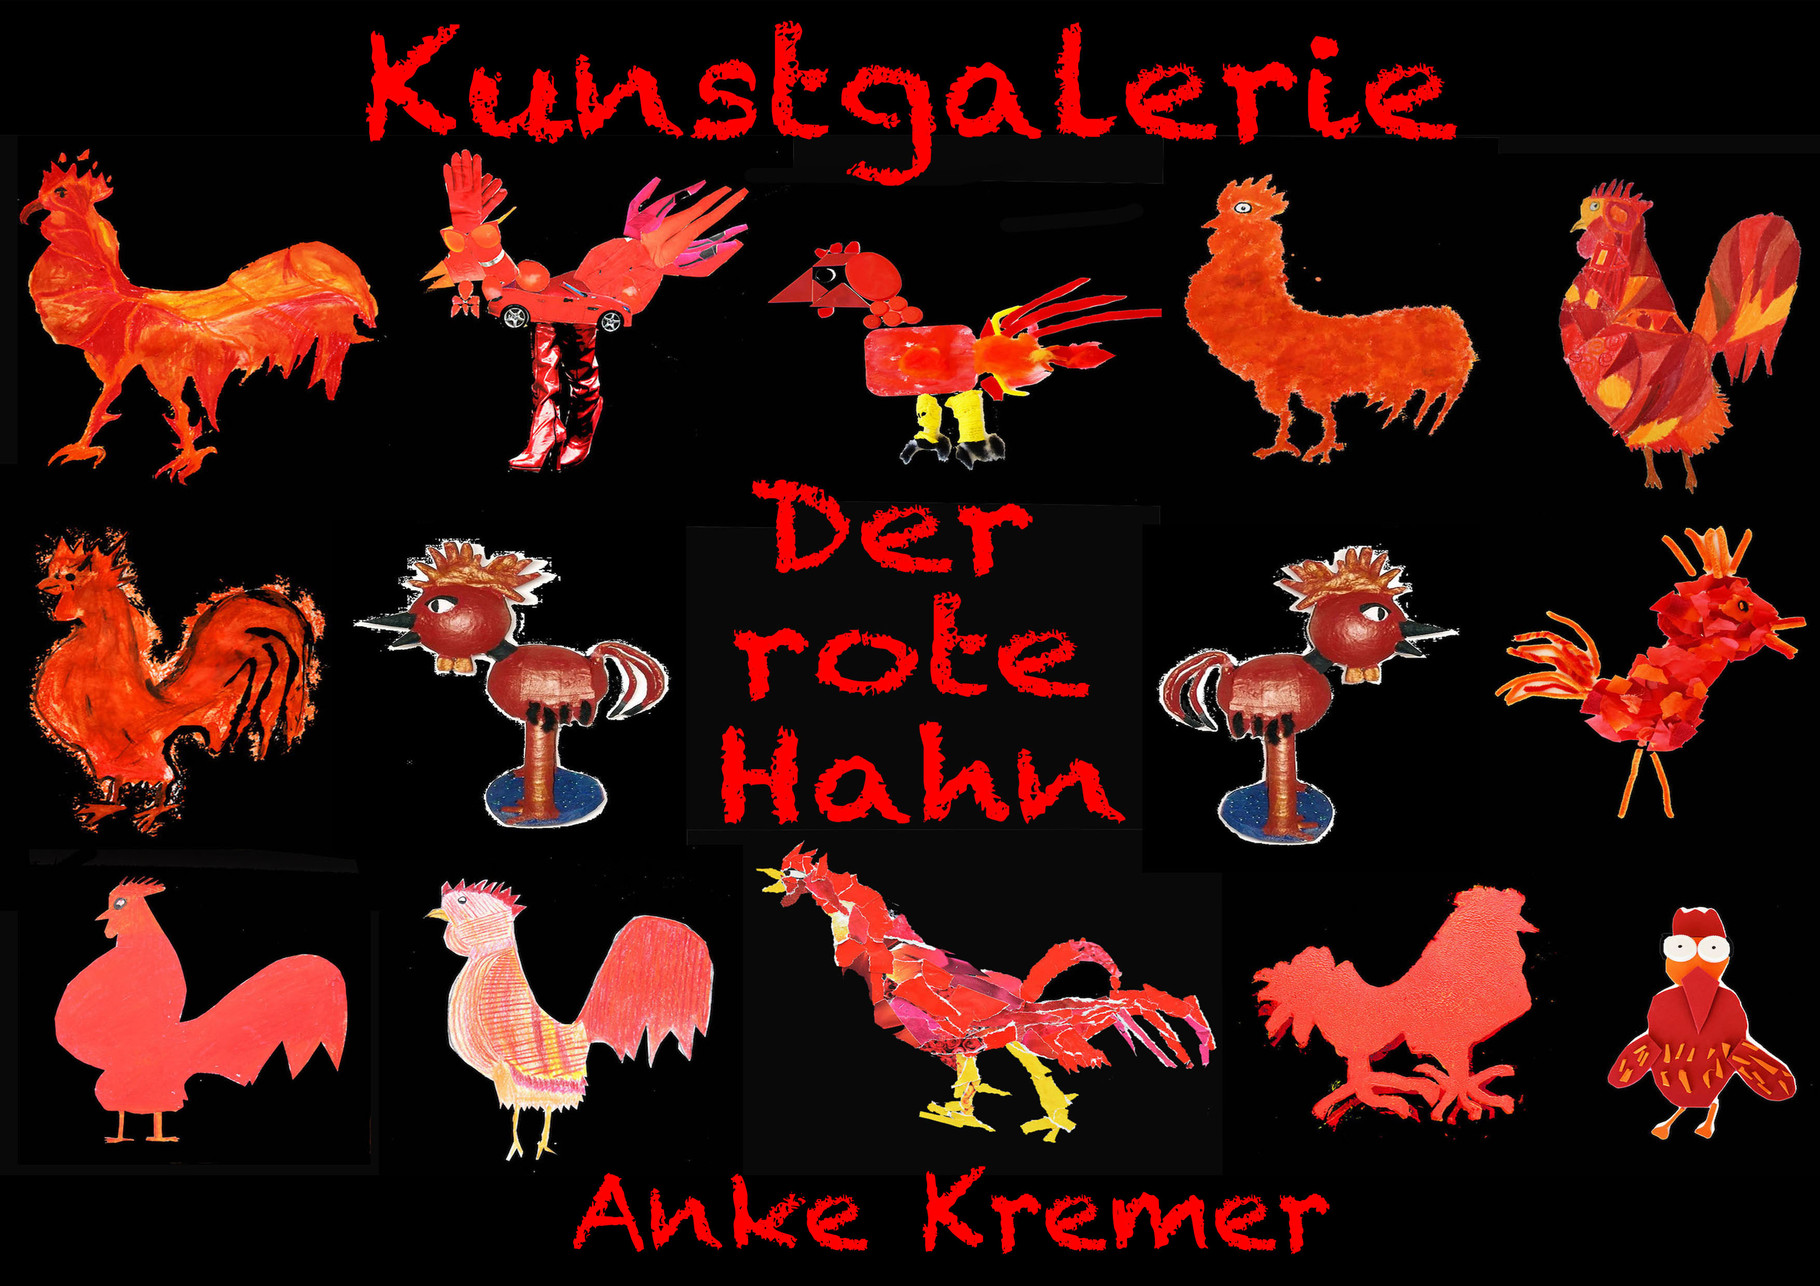 Roter Hahn Kunst kunstgalerie der rote hahn anke kremer 136s webseite